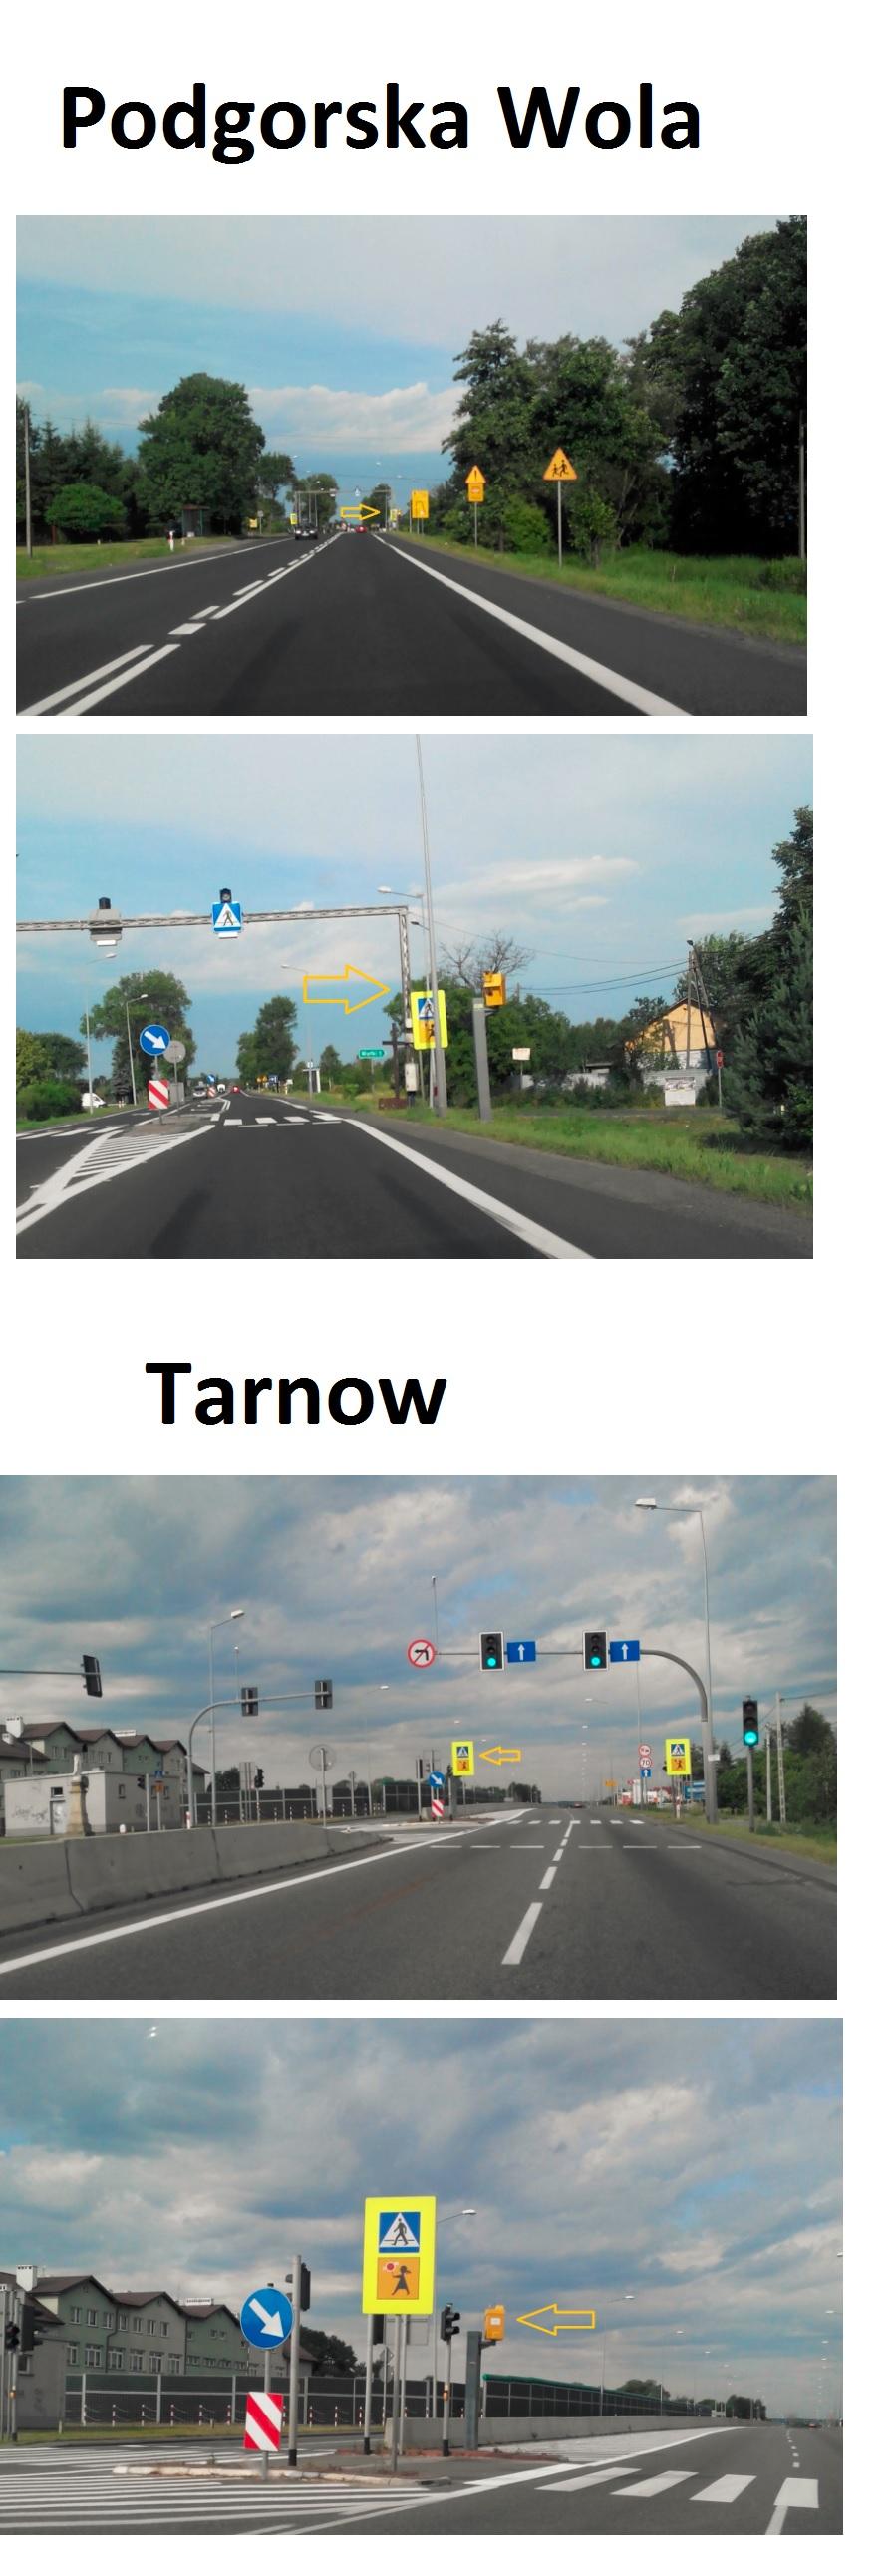 podgorska_wola_tarnowjpg